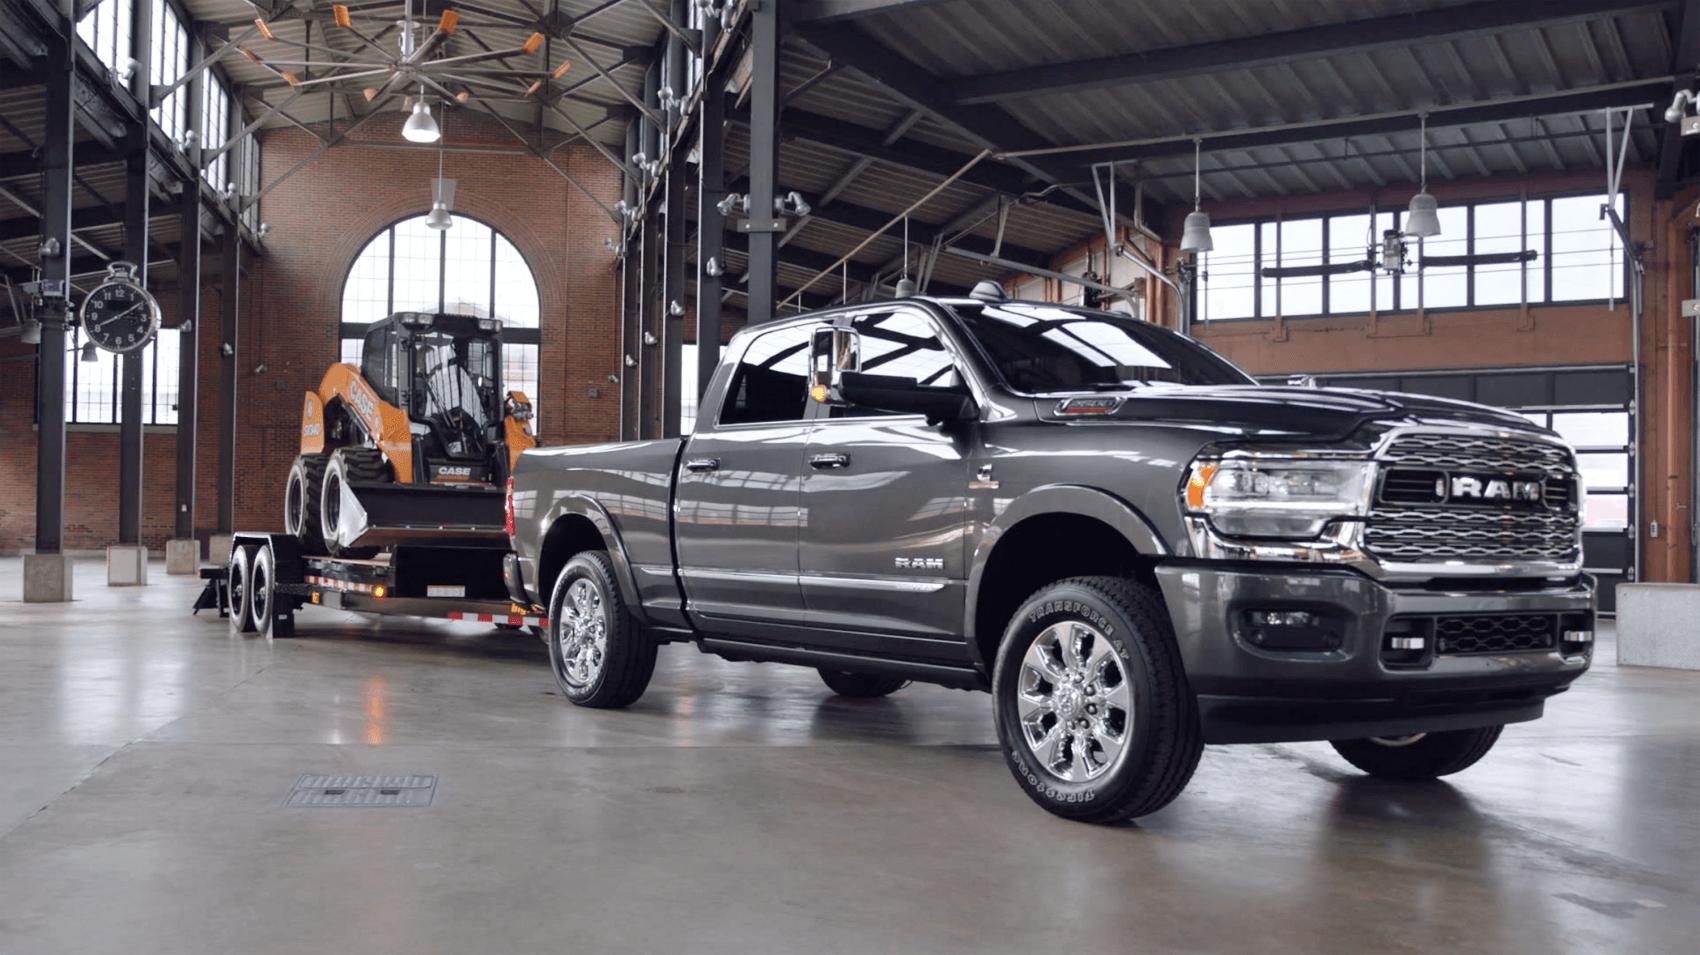 2021 Ram 2500 Towing Gray